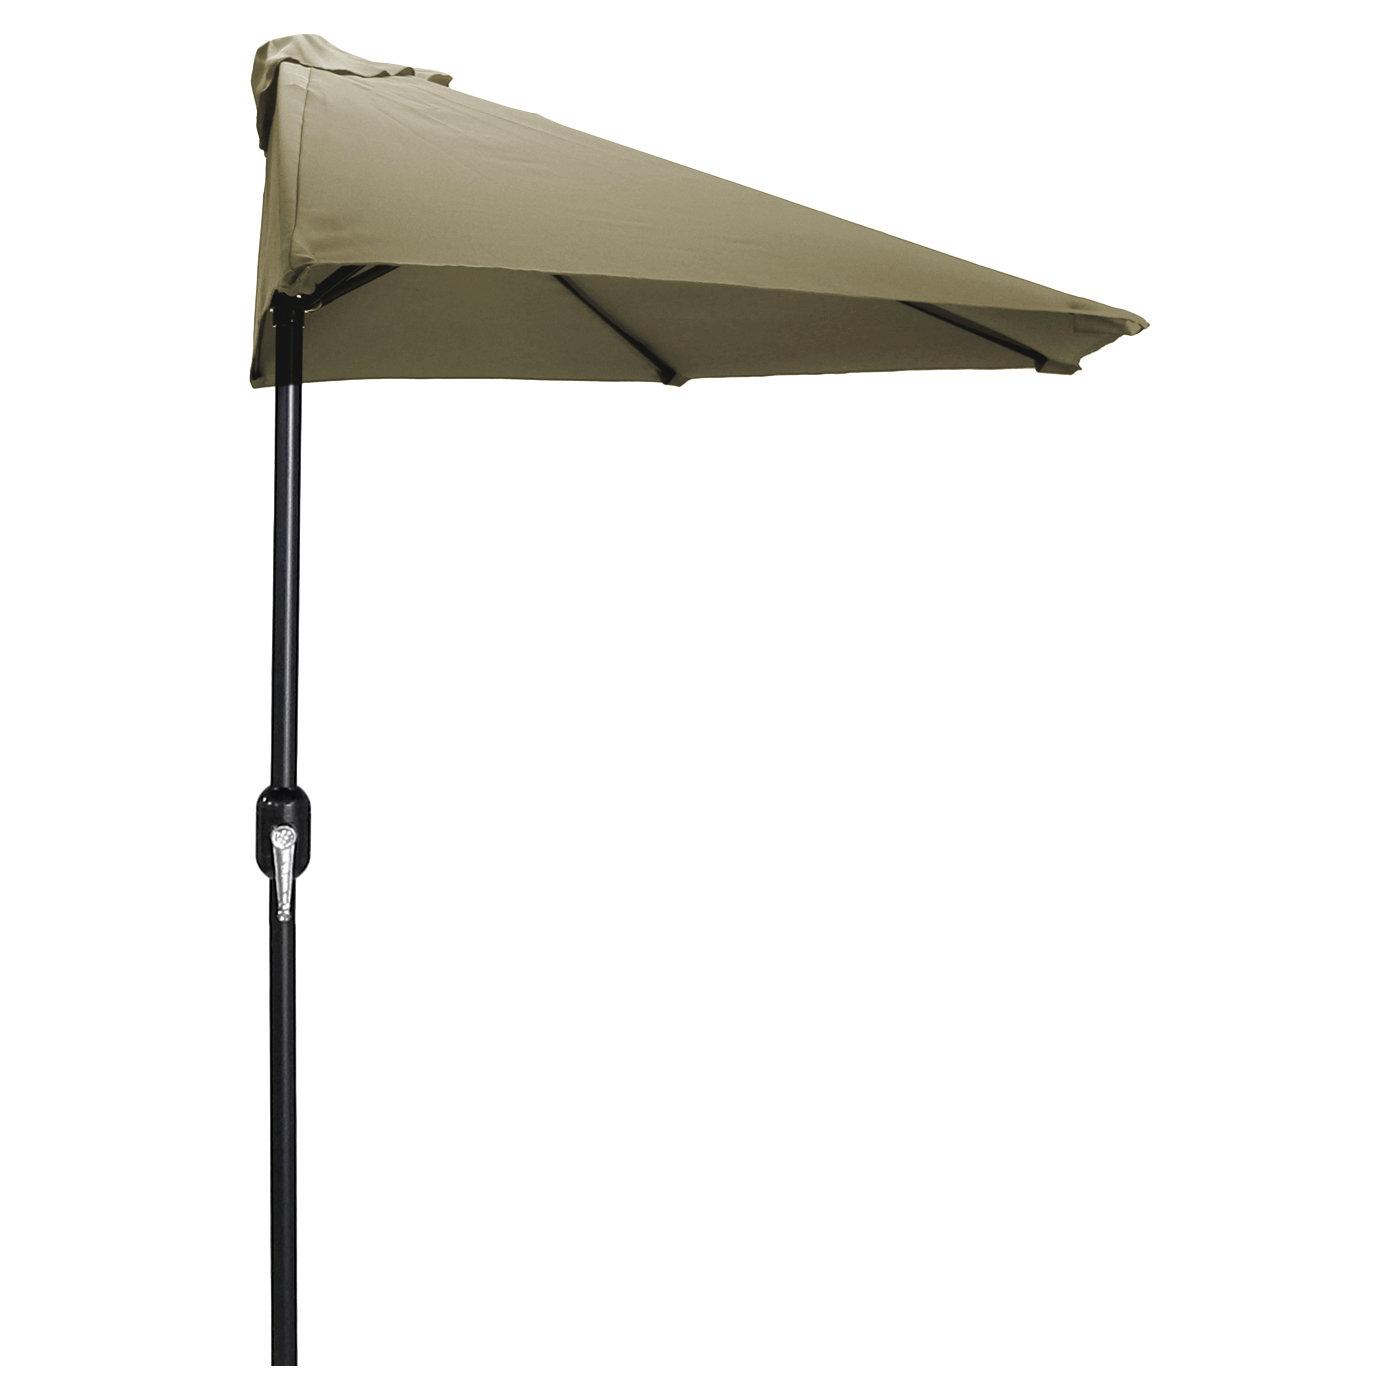 Latest Alder Half Round Outdoor Patio Market Umbrellas For Sheehan Market Umbrella (View 10 of 20)